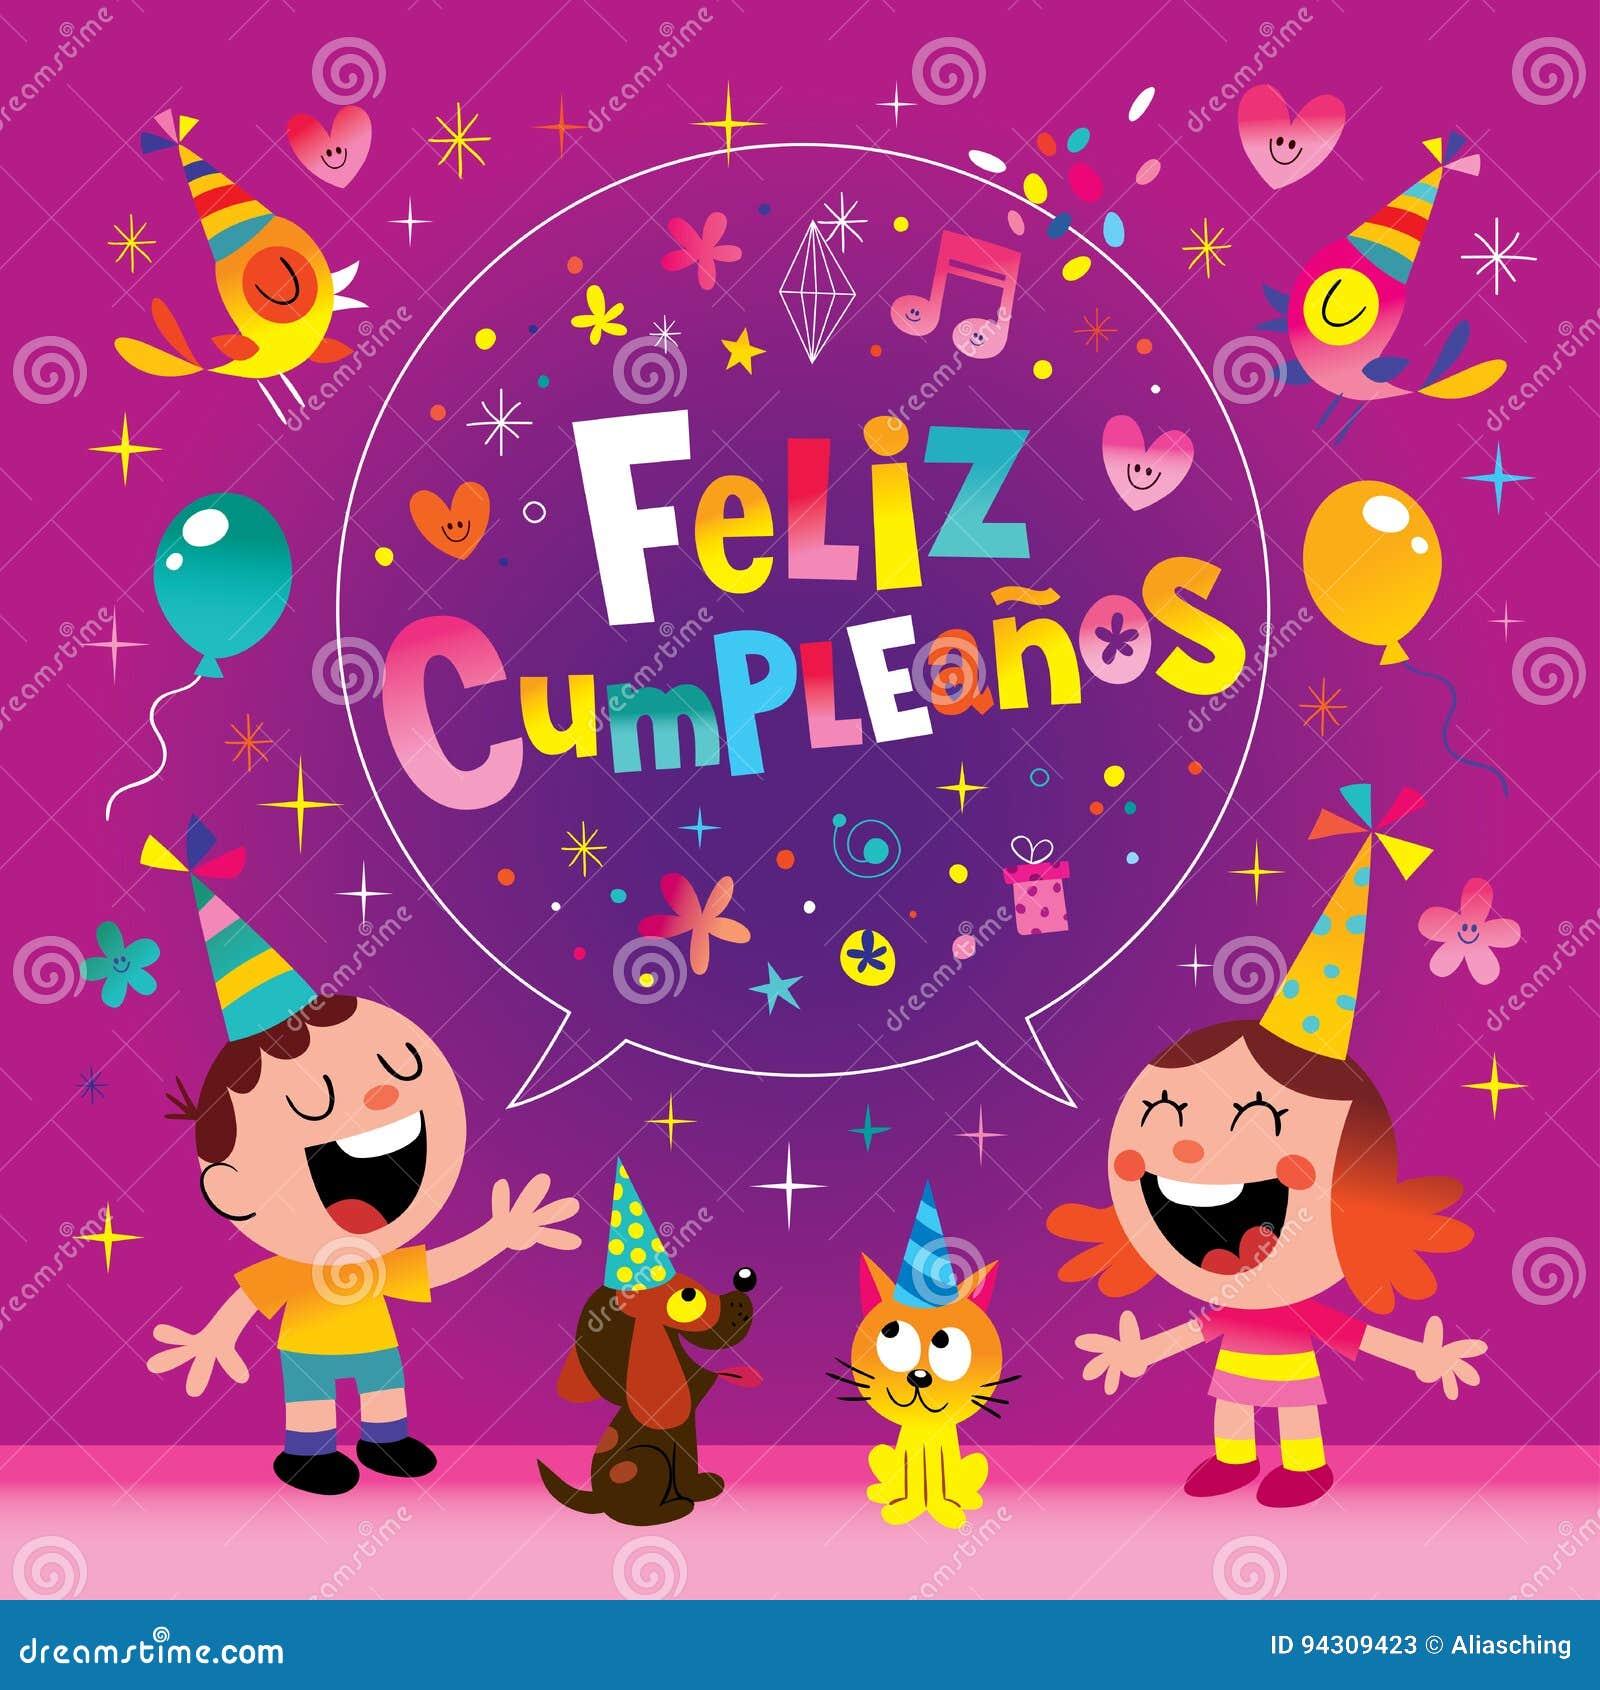 Feliz Cumpleanos Happy Birthday In Spanish Kids Stock Vector